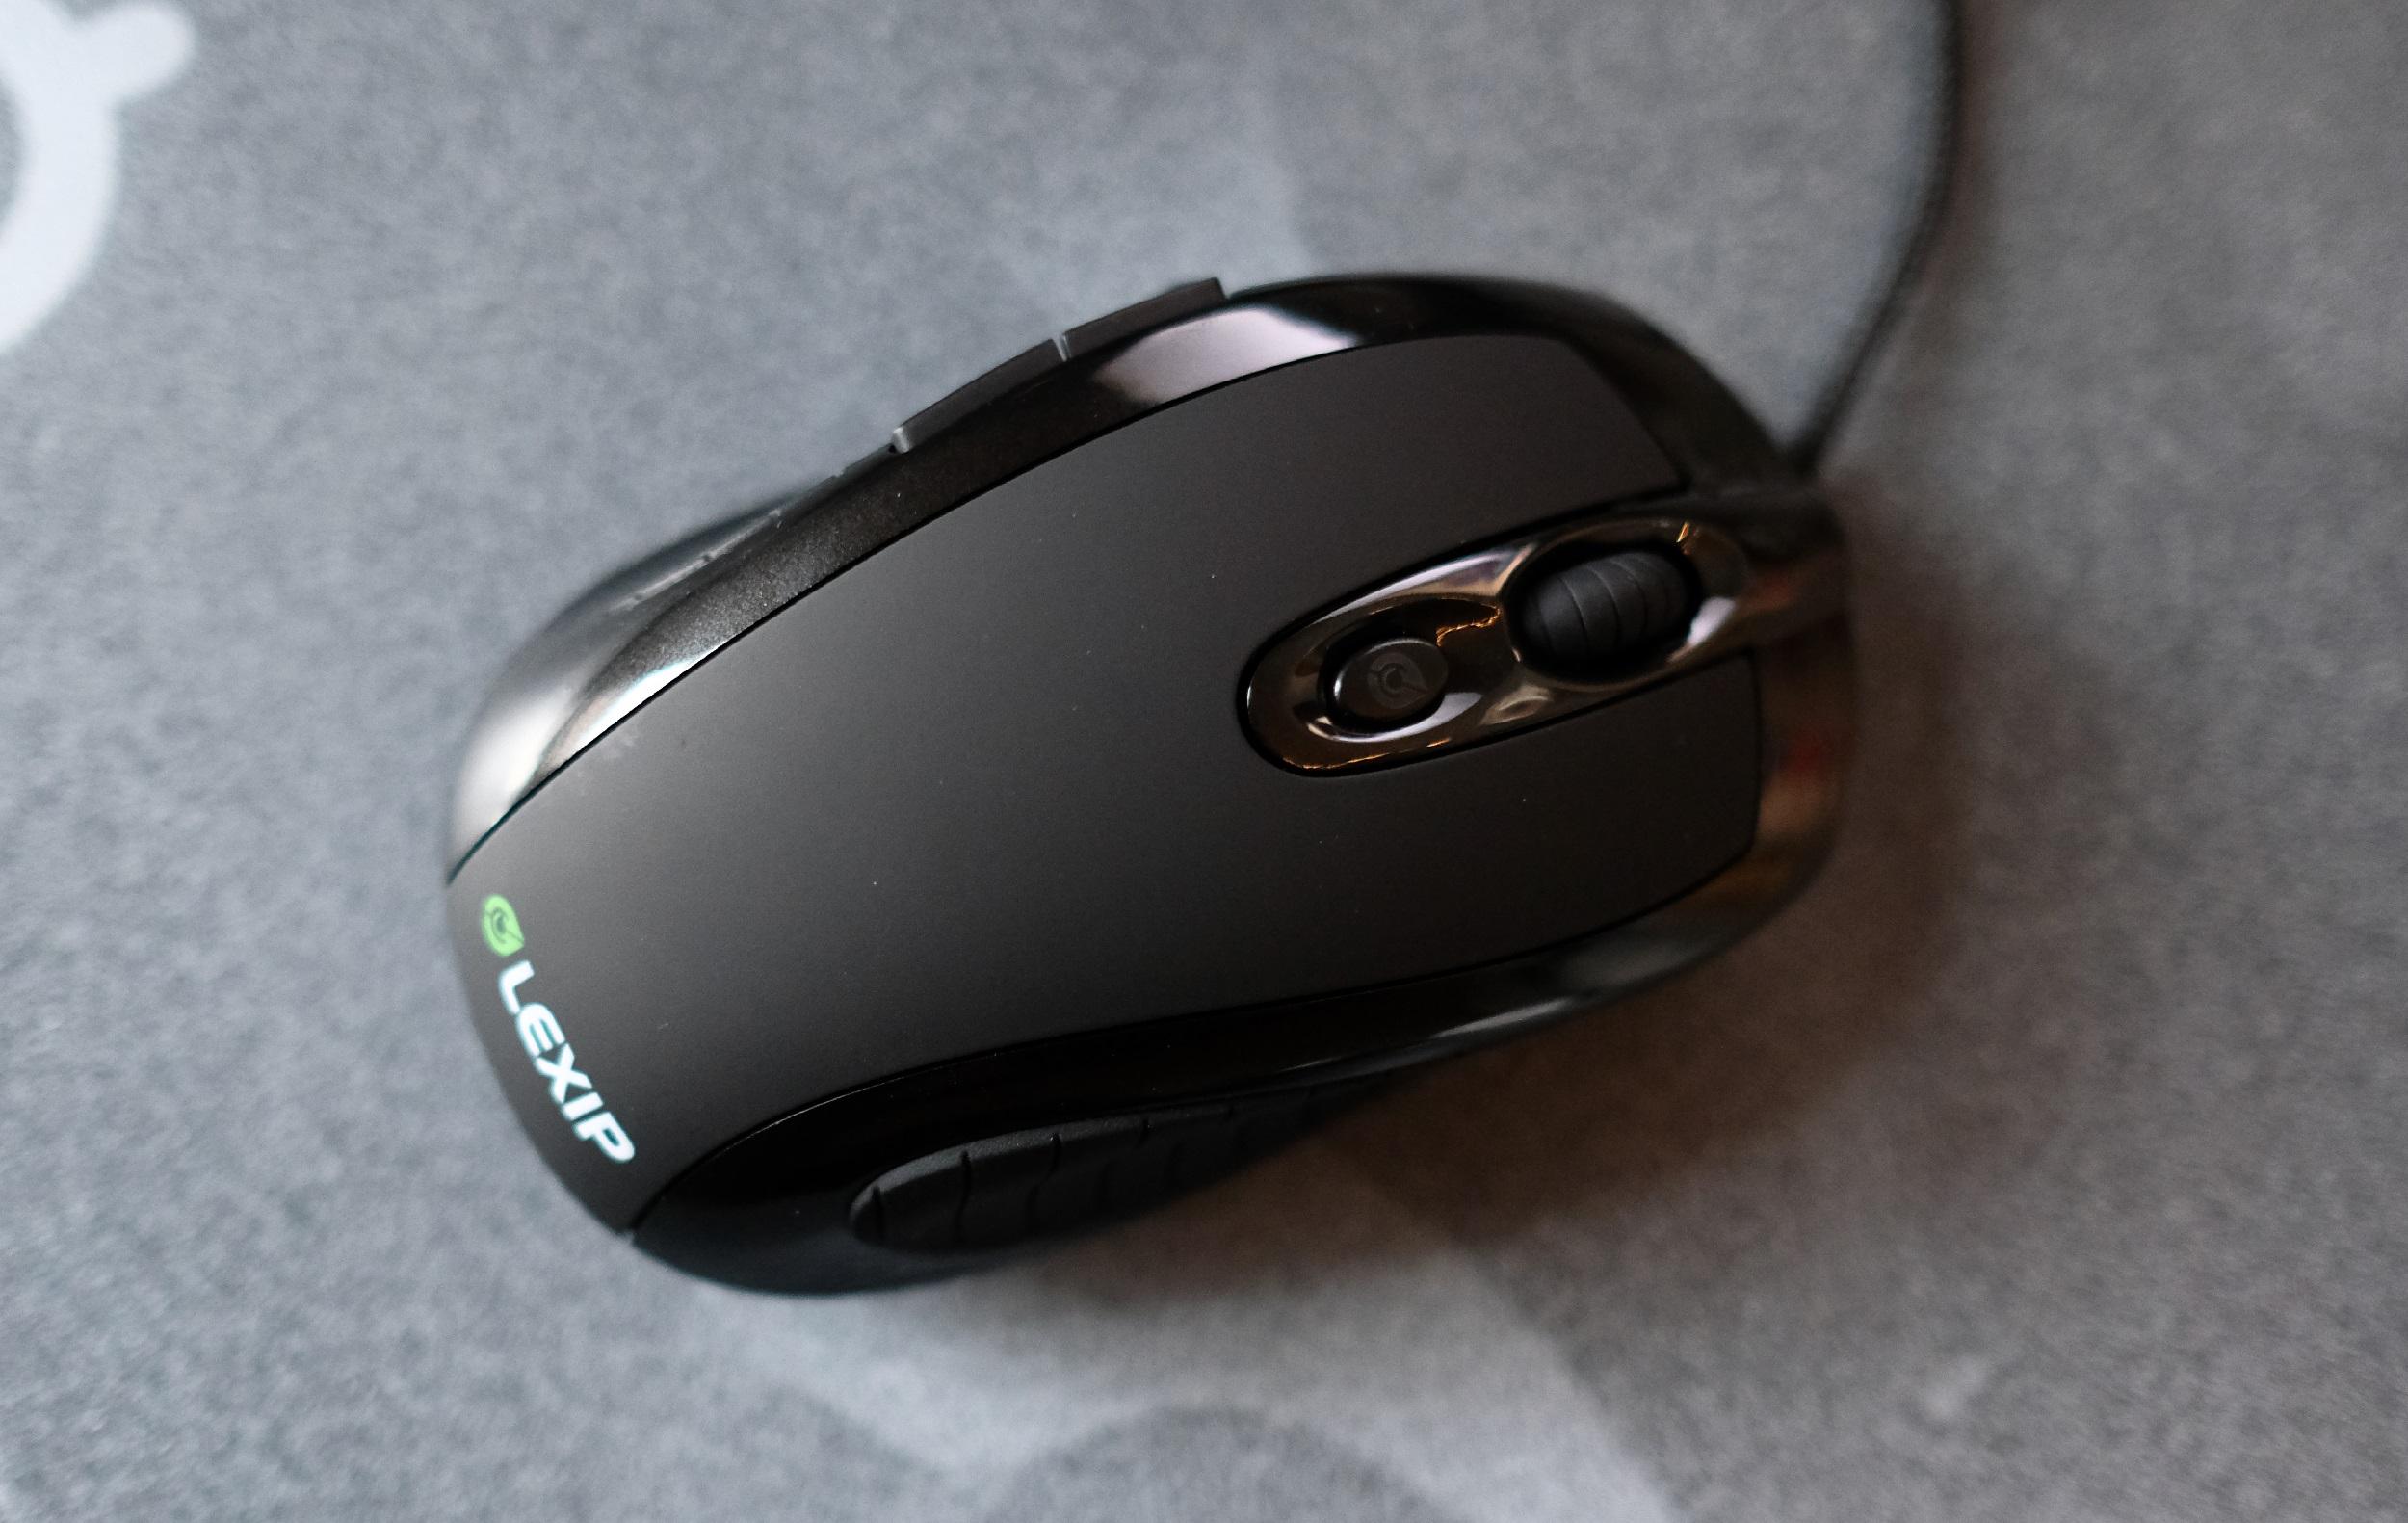 Lexip's joystick-mouse combo is a strange but promising